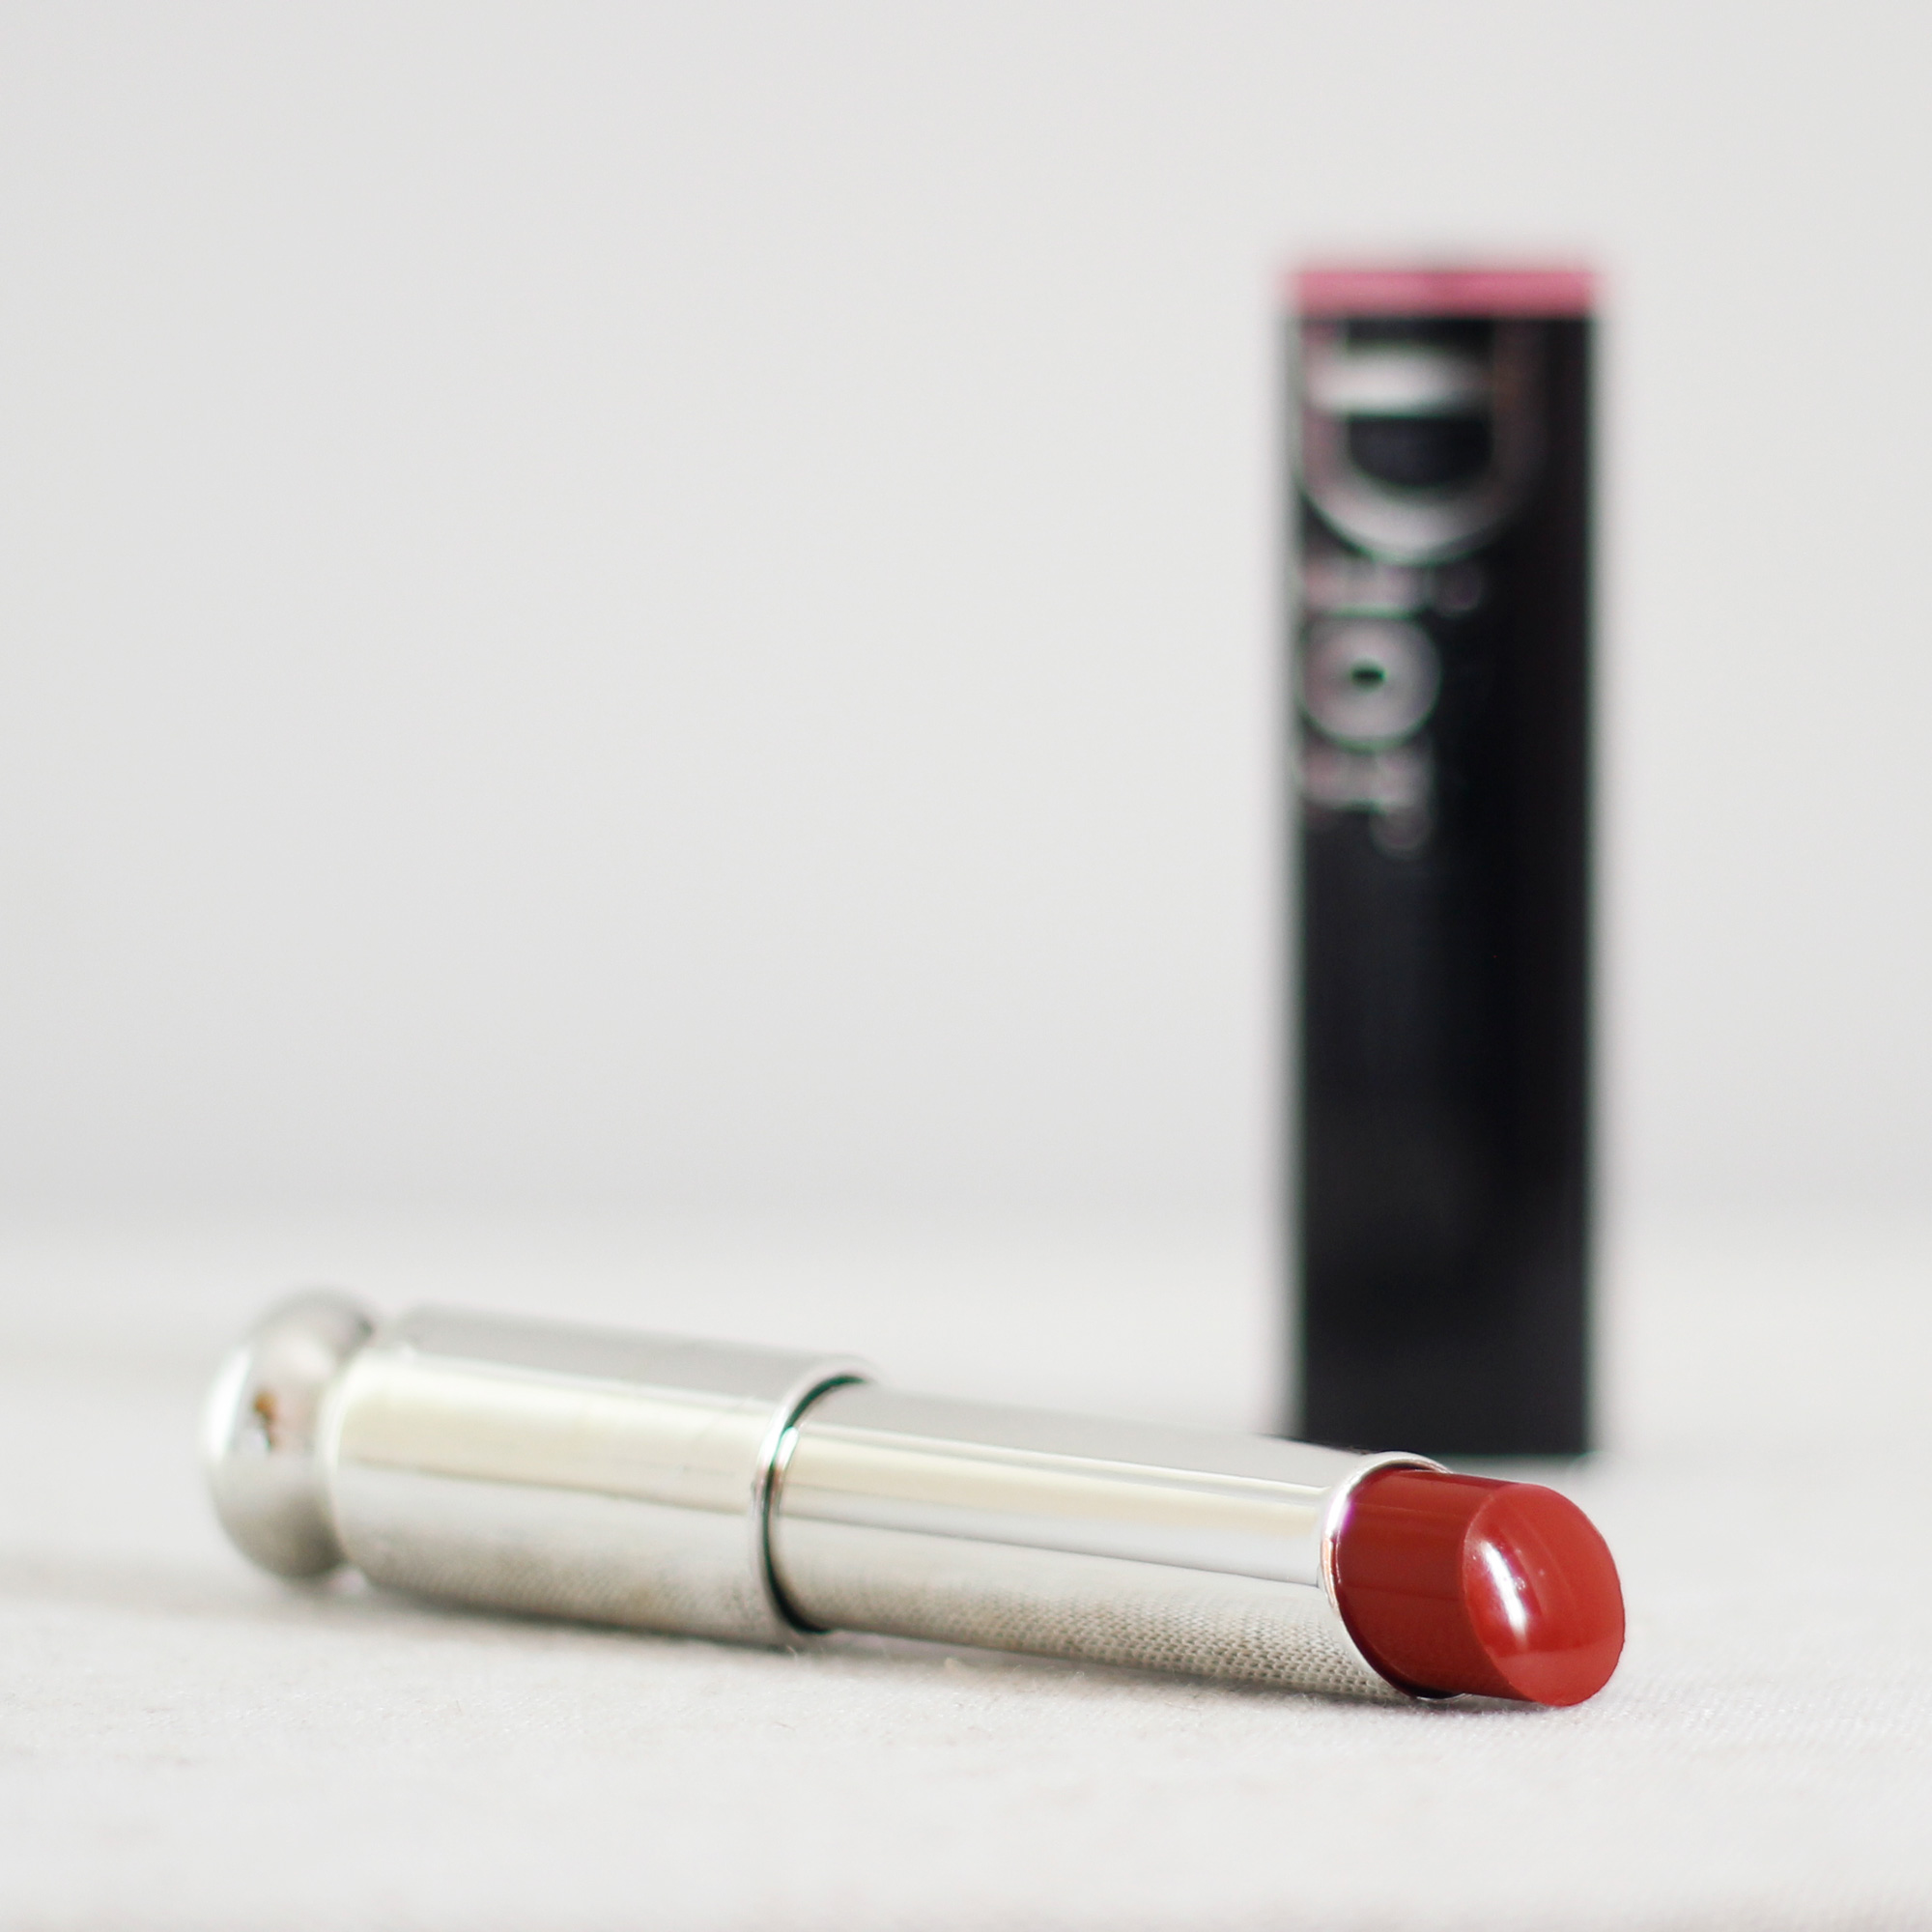 Dior Addict Lacquer Stick Màu 740